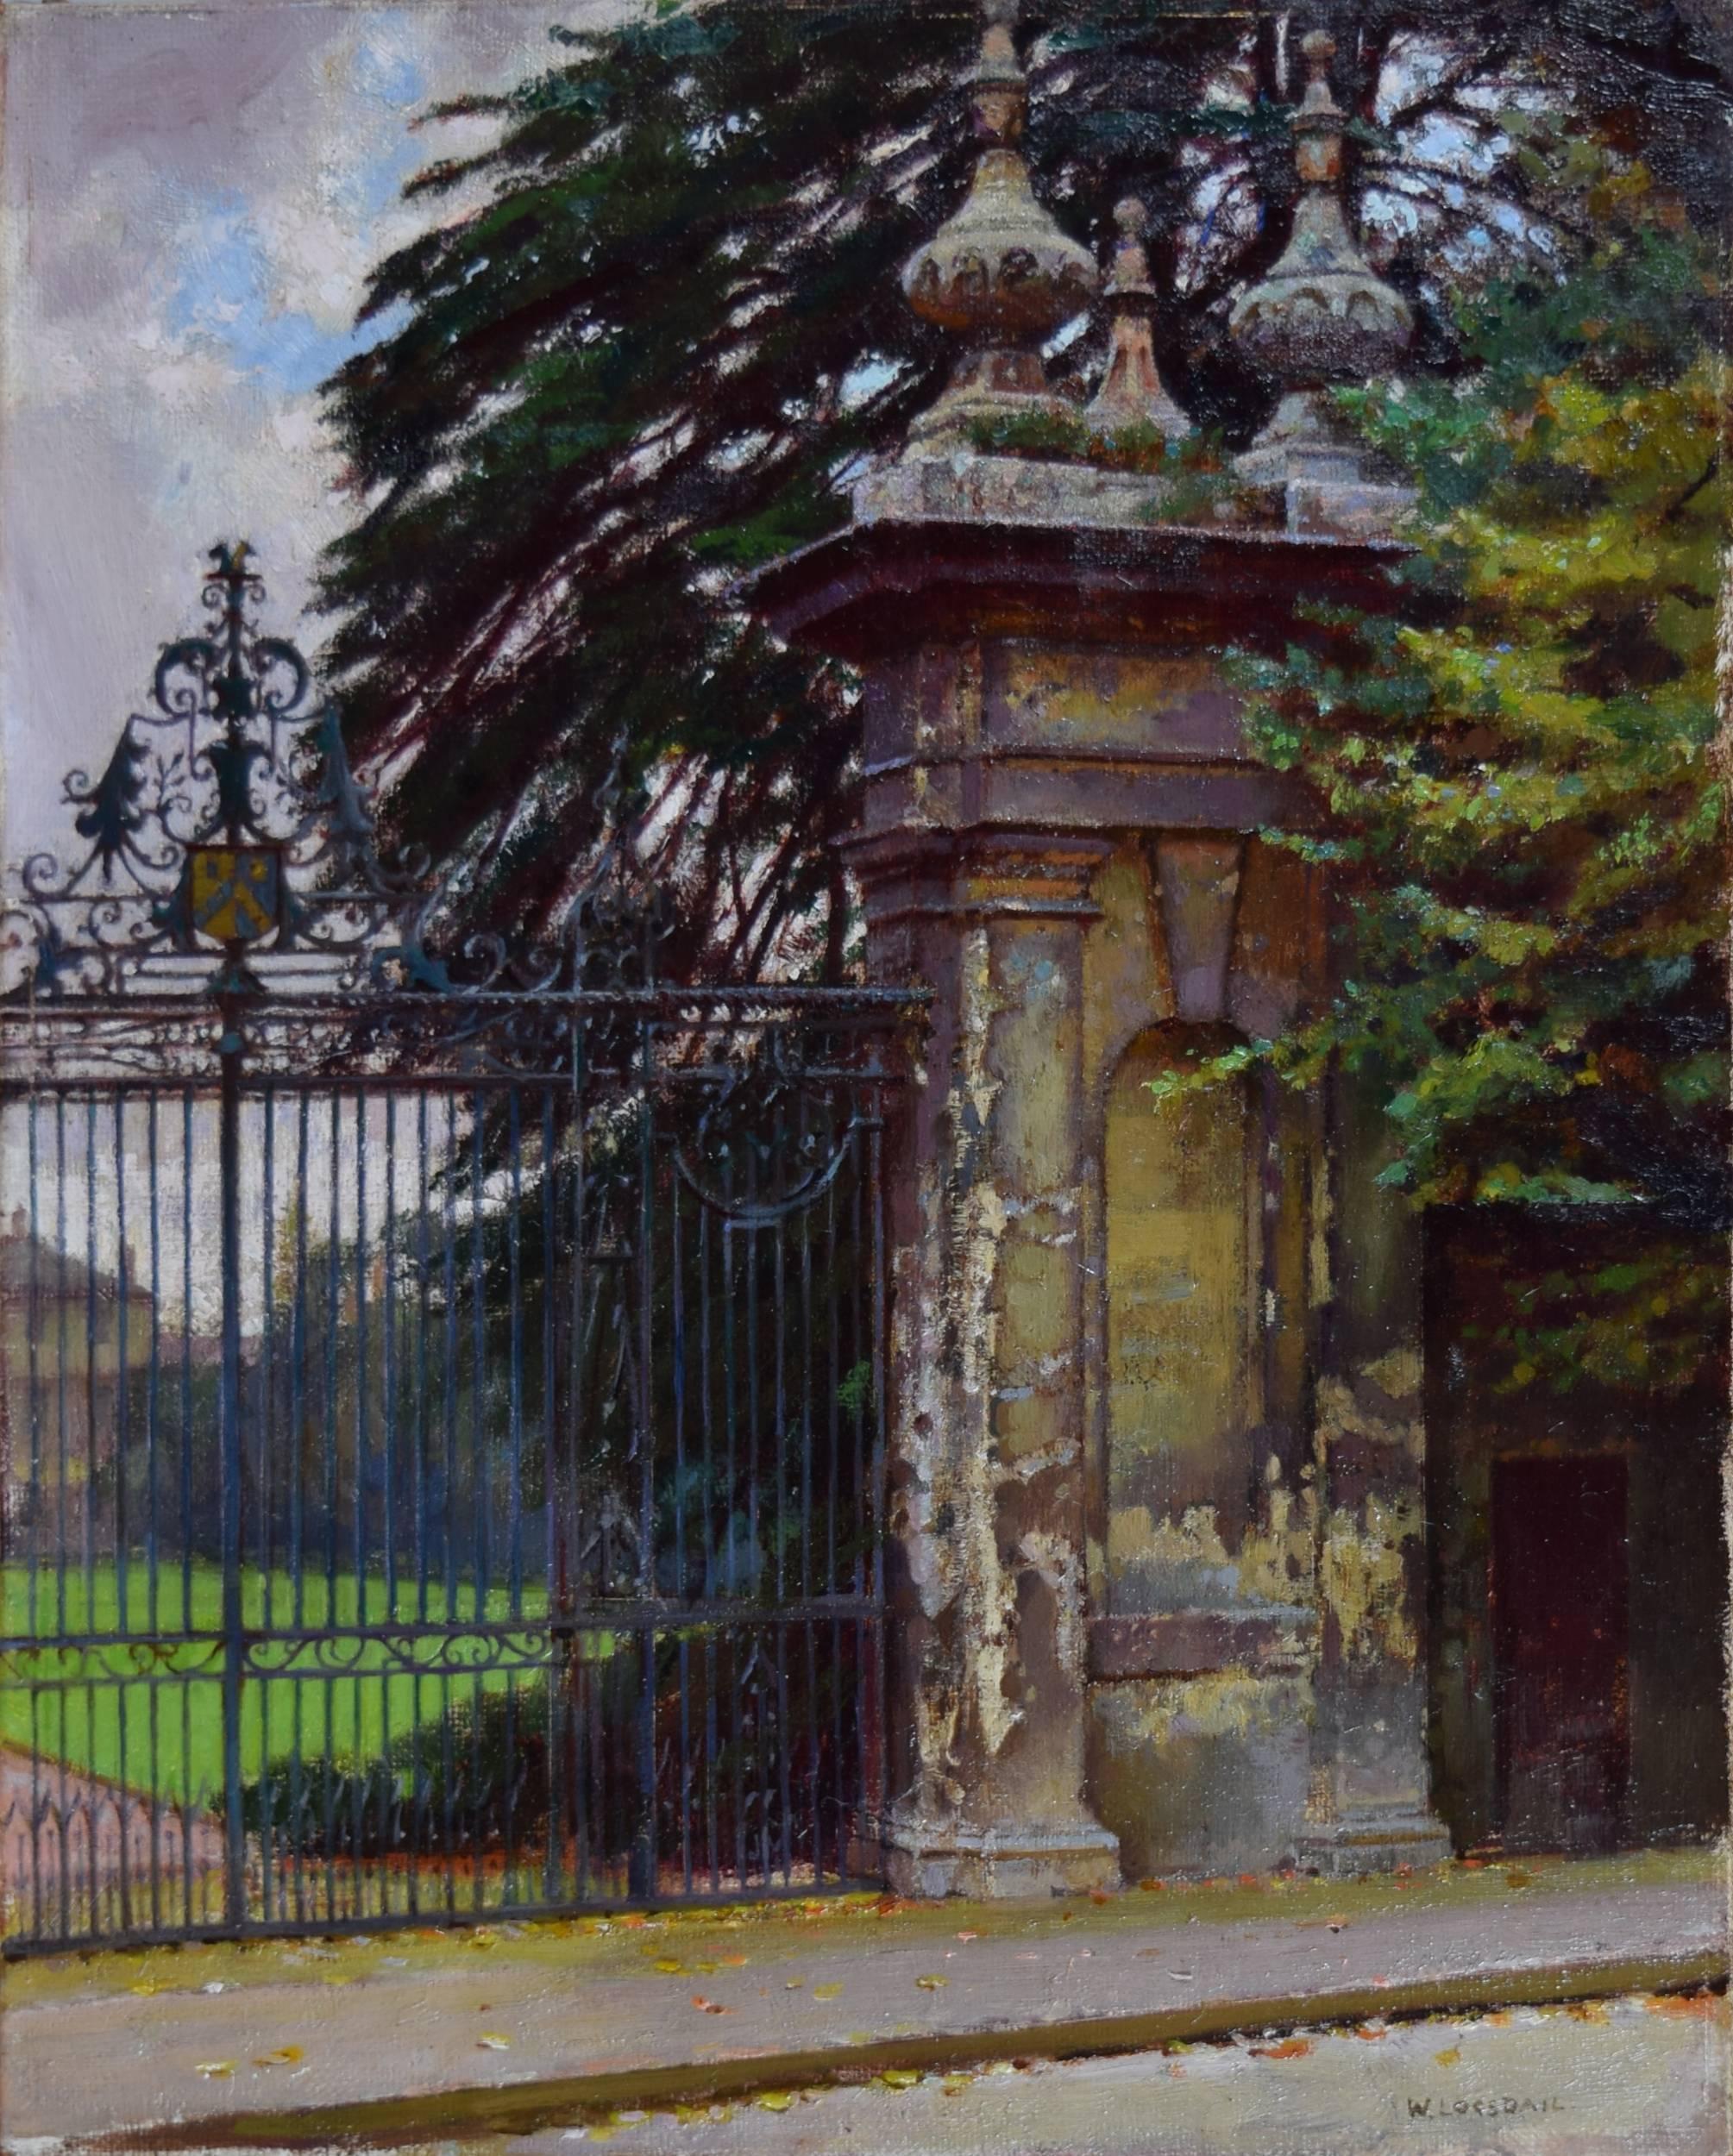 William Logsdail, Trinity College Gateway, Oxford, Oil painting c. 1900